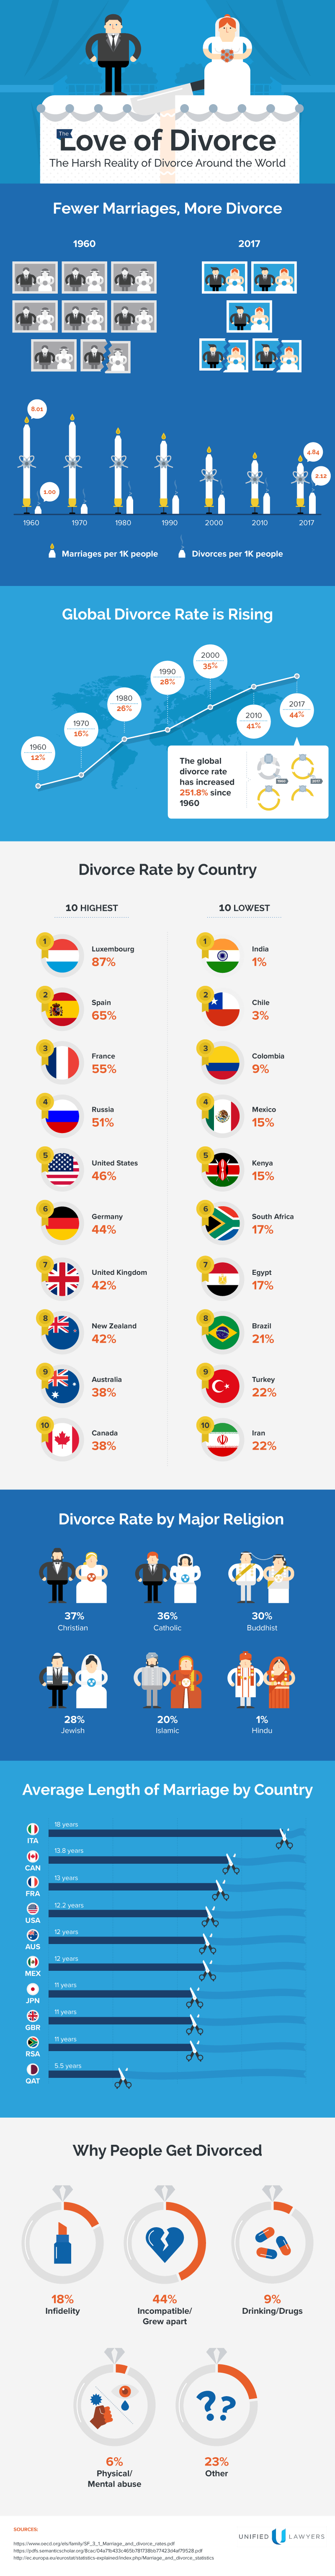 آمار جهانی طلاق  آمار جهانی طلاق love of divorce rates around the world